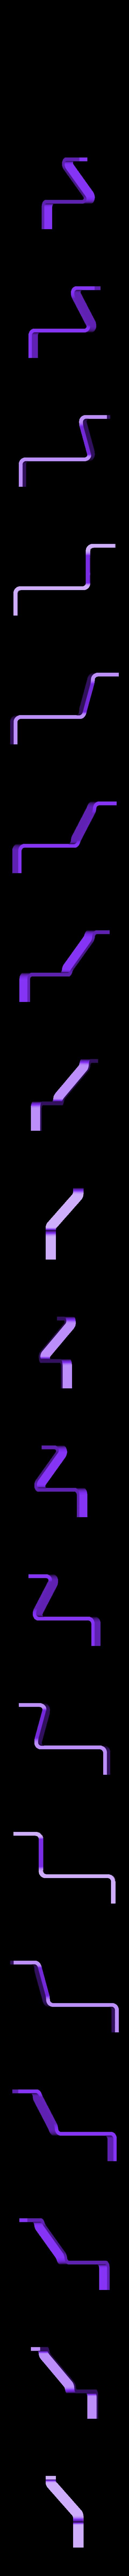 pilot_step_2.STL Download free STL file 4-8-8-4 Big Boy Locomotive • 3D printer object, RaymondDeLuca